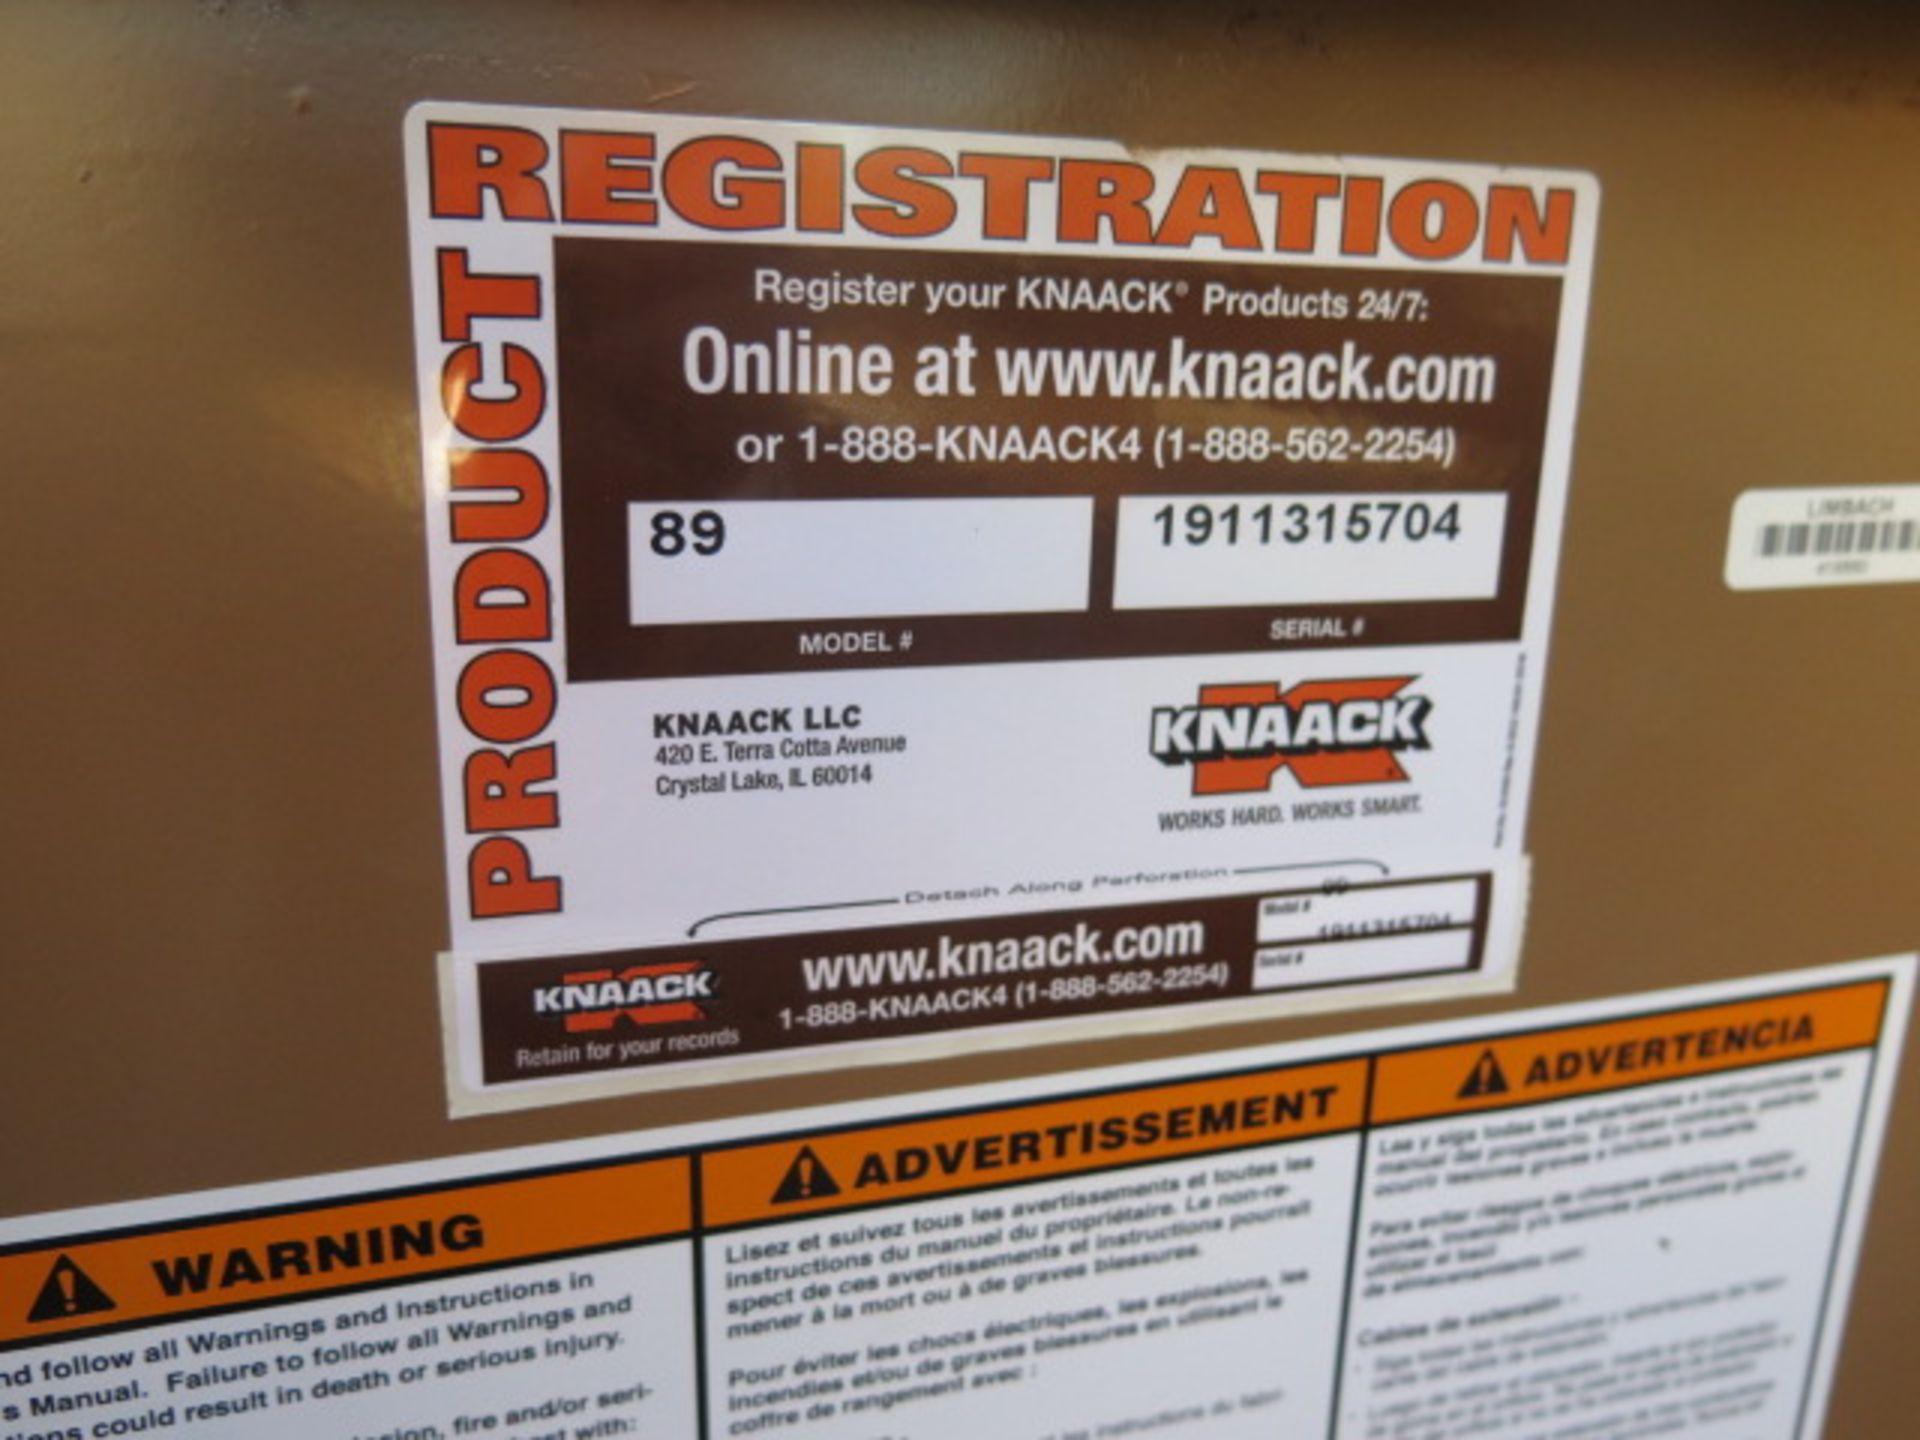 Knaack mdl. 89 Storagemaster Rolling Job Box (SOLD AS-IS - NO WARRANTY) - Image 11 of 11